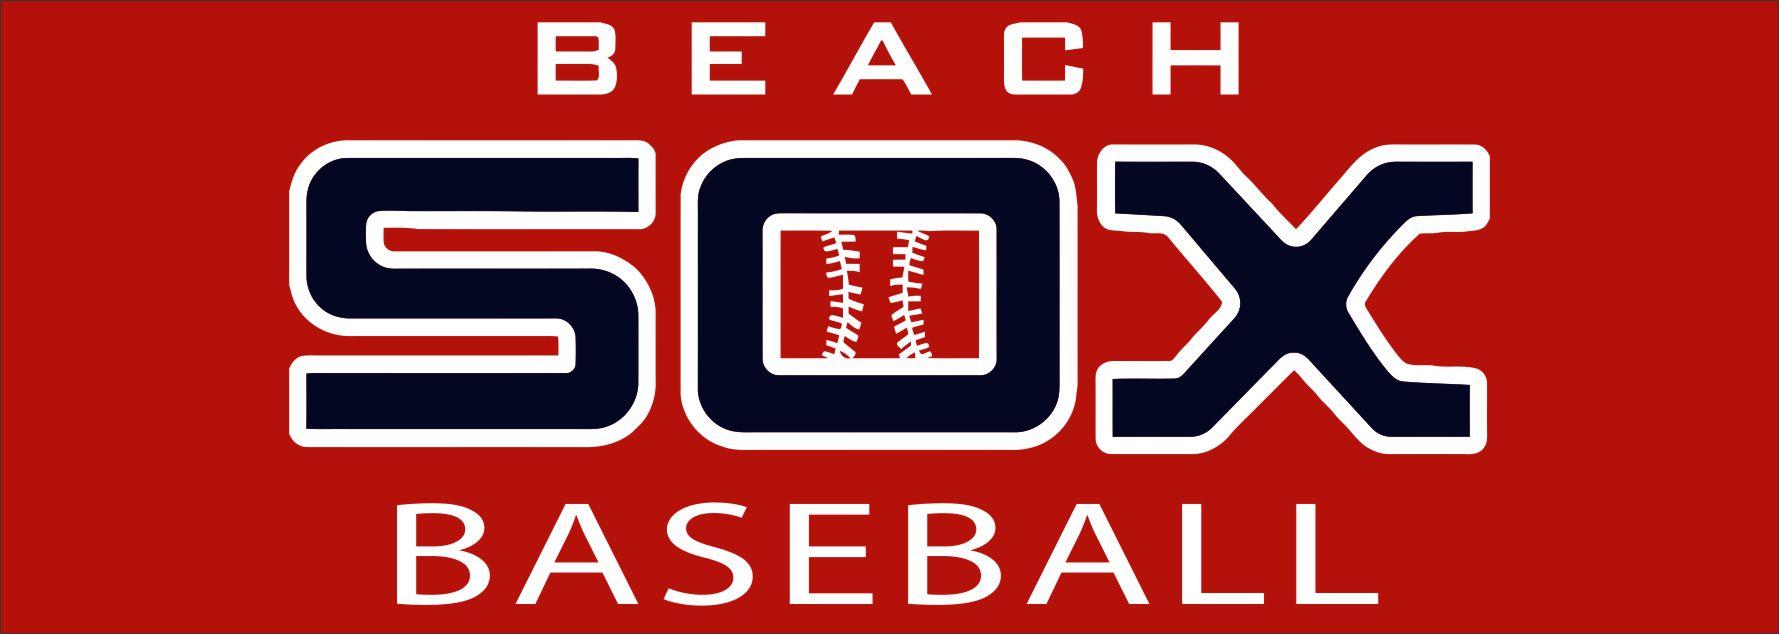 beach-sox-2021-logo.jpg